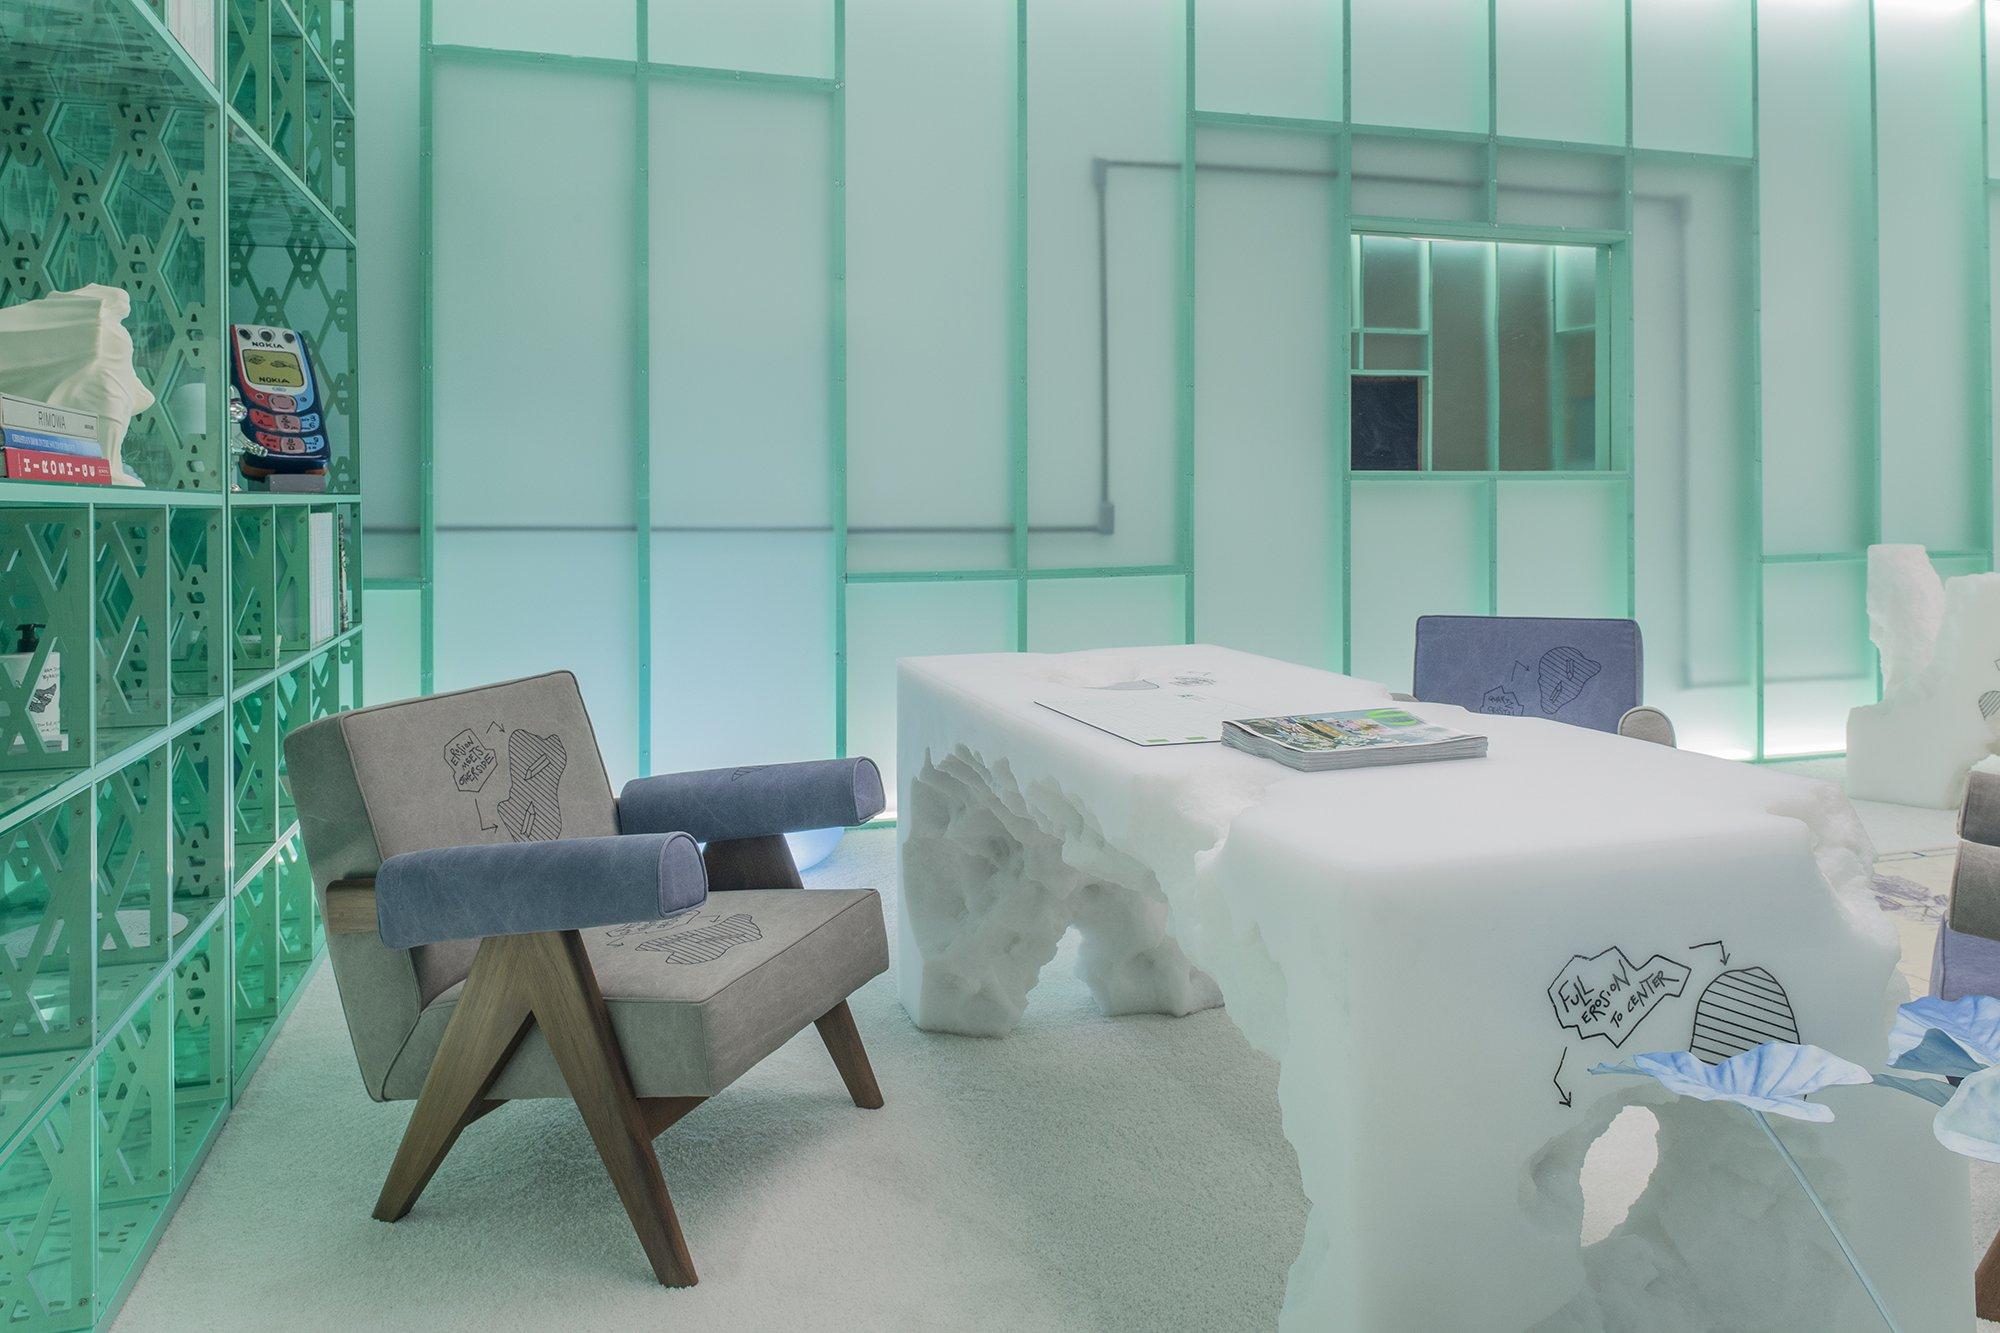 Design Miami 2019, Friedman Benda booth X Daniel Arsham